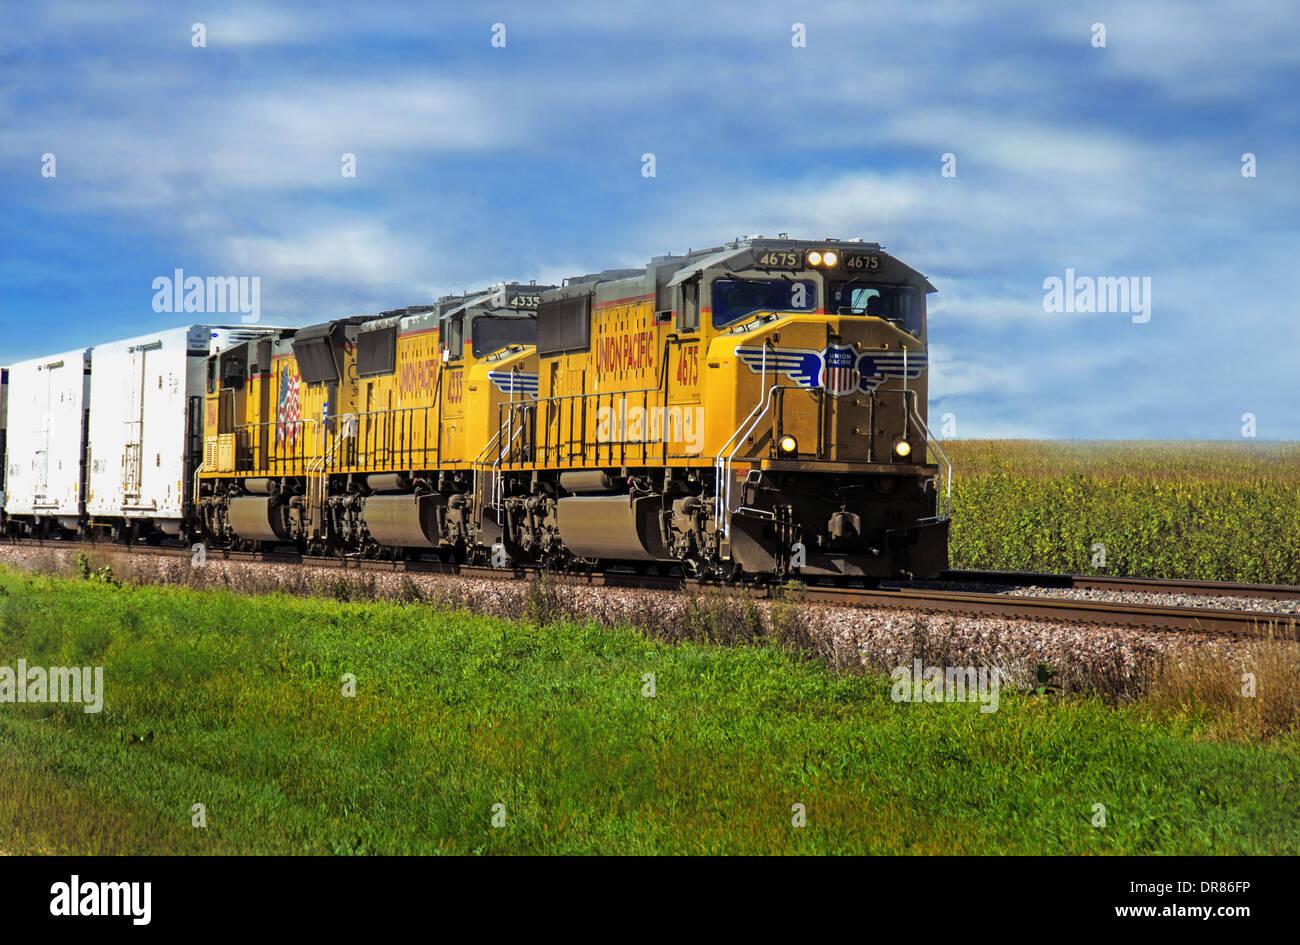 Union Pacific en las vías de tren cerca de la carretera cerca de Lincoln a Ashton, Illinois Imagen De Stock